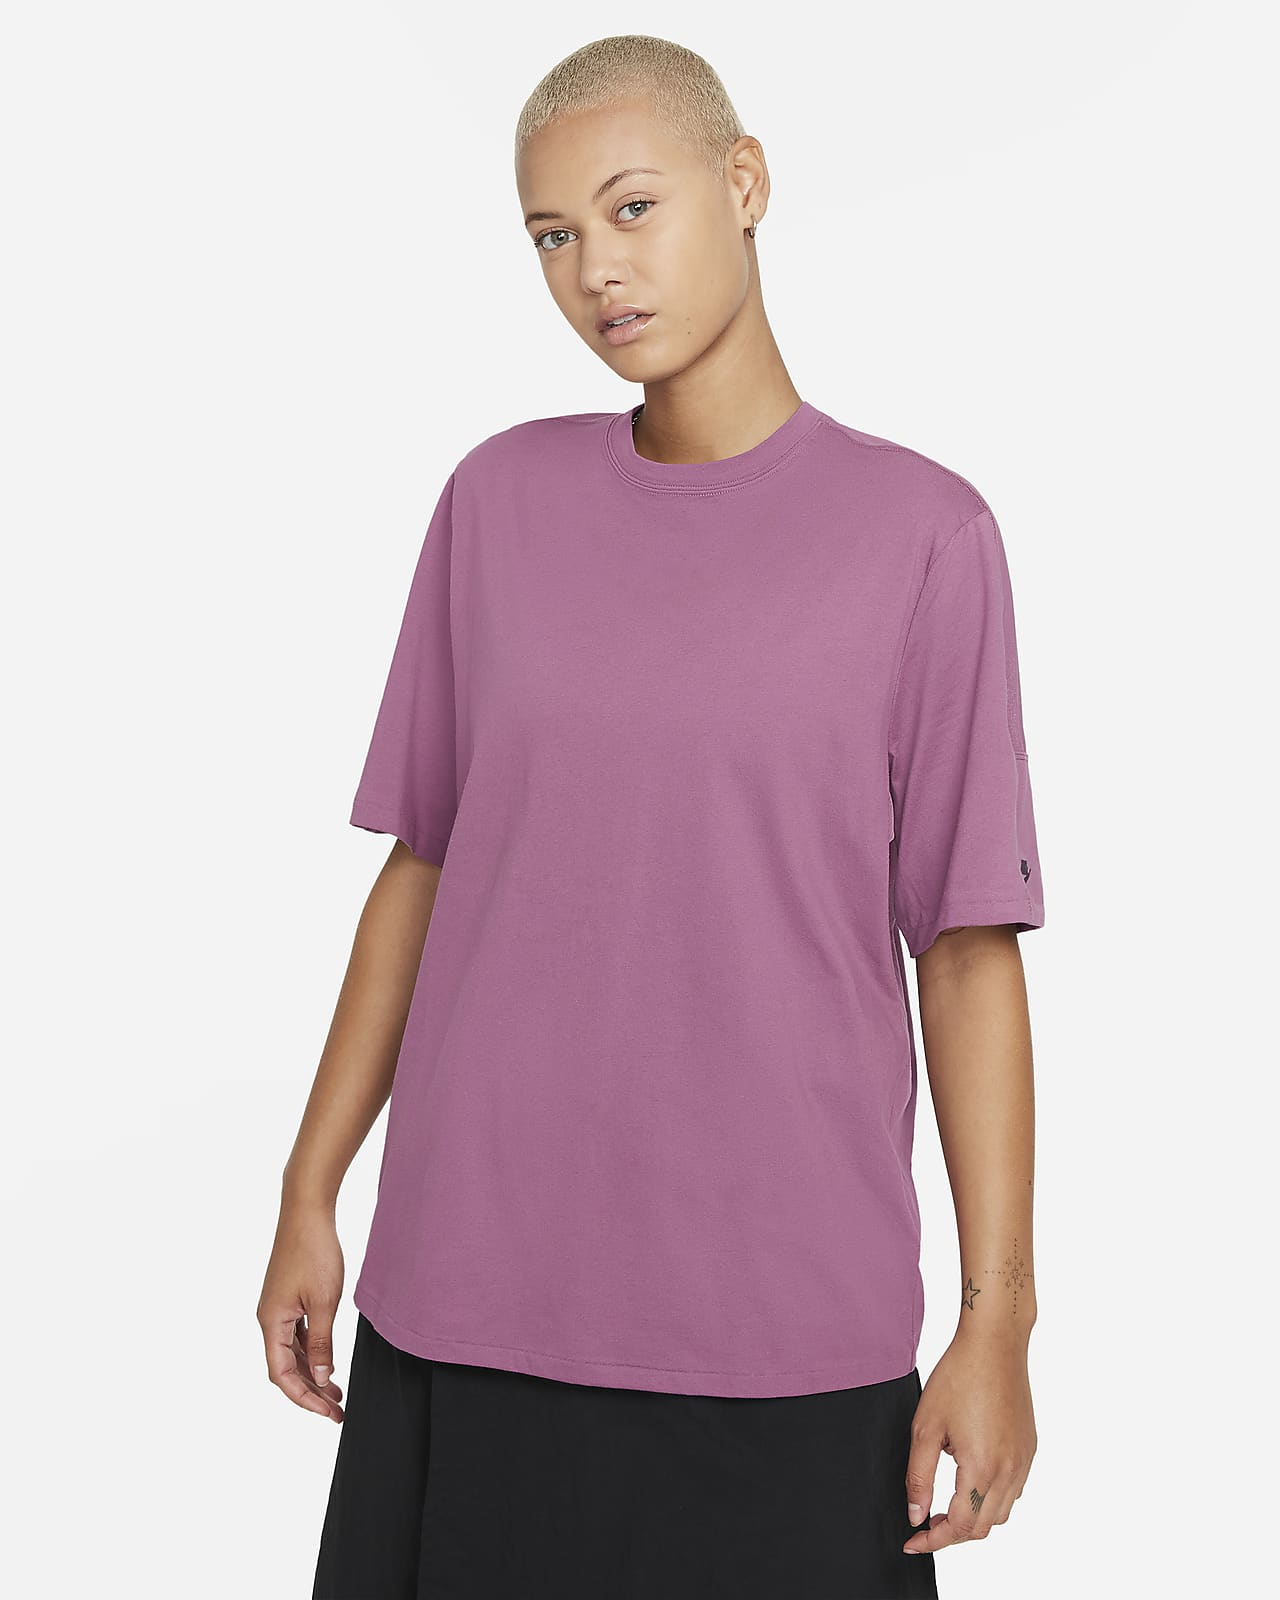 Nike Sportswear Dri-FIT ADV Tech Pack Kurzarm-Oberteil für Damen